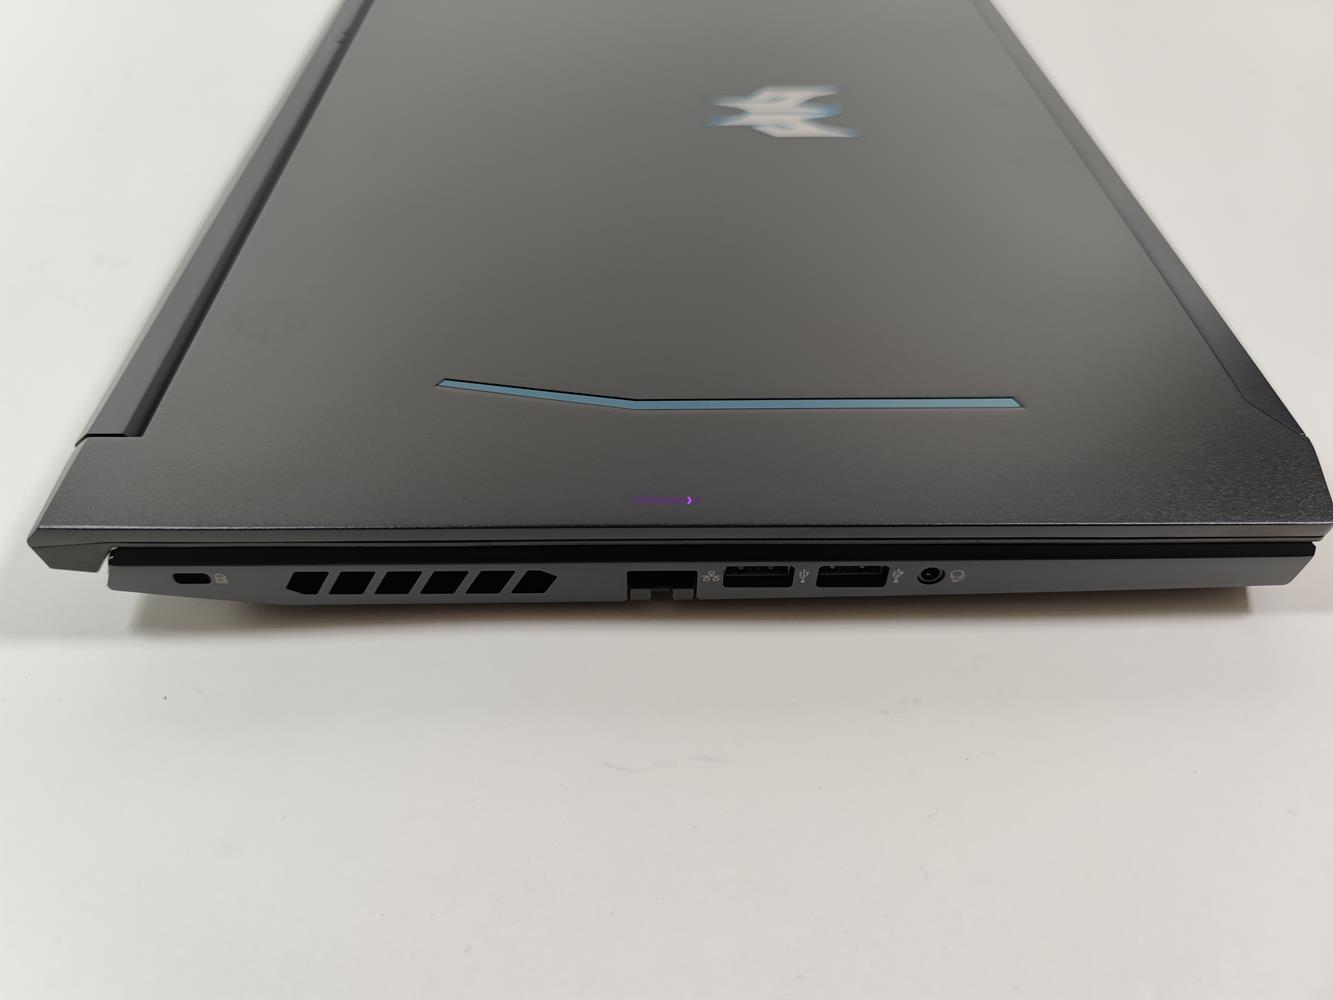 test Acer Predator Helios 300 PH315-53-73QQ, recenzja Acer Predator Helios 300 PH315-53-73QQ, opinia Acer Predator Helios 300 PH315-53-73QQ